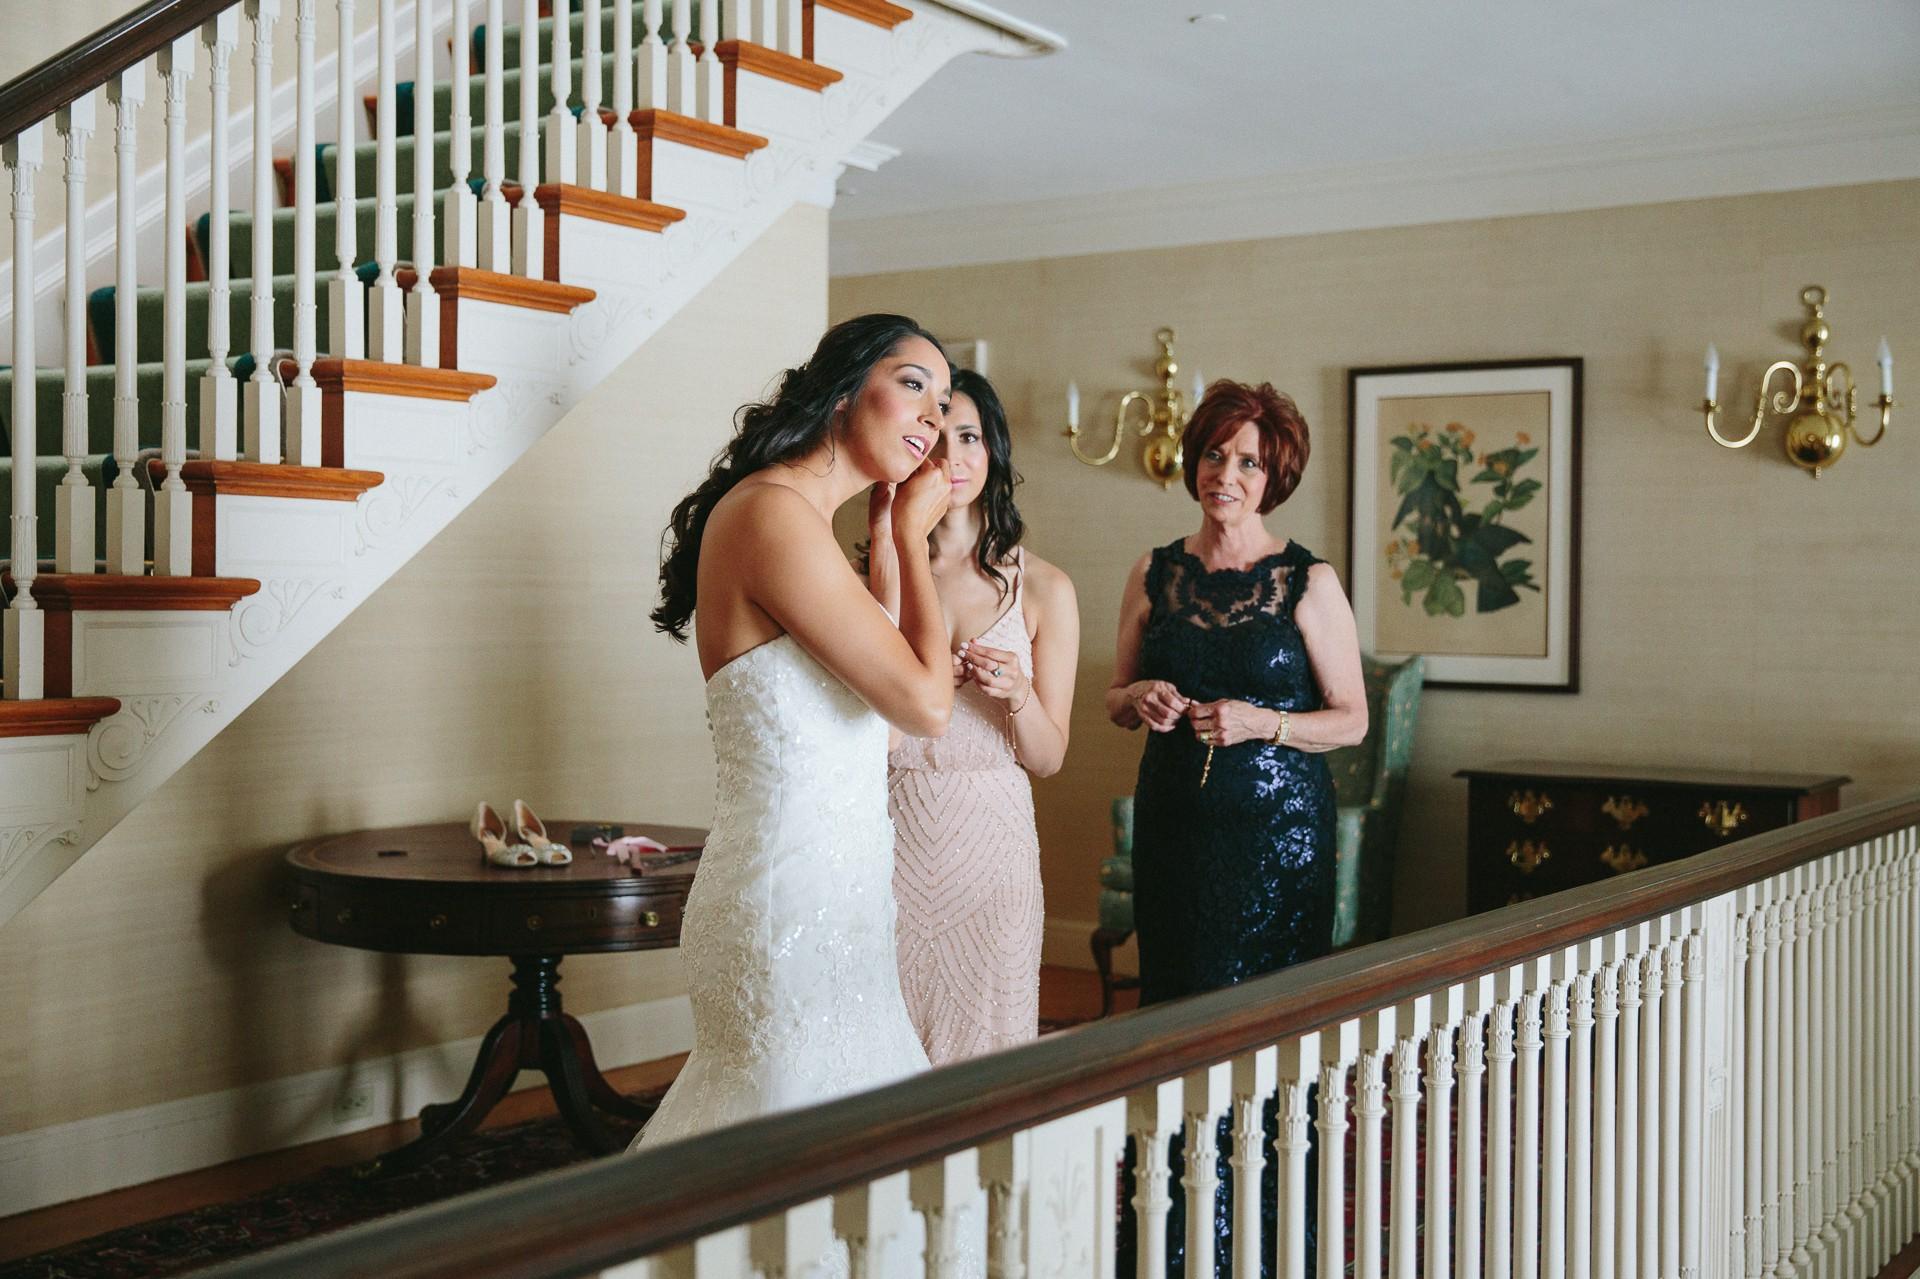 Bolton House Wedding Photographer in Beachwood 12.jpg